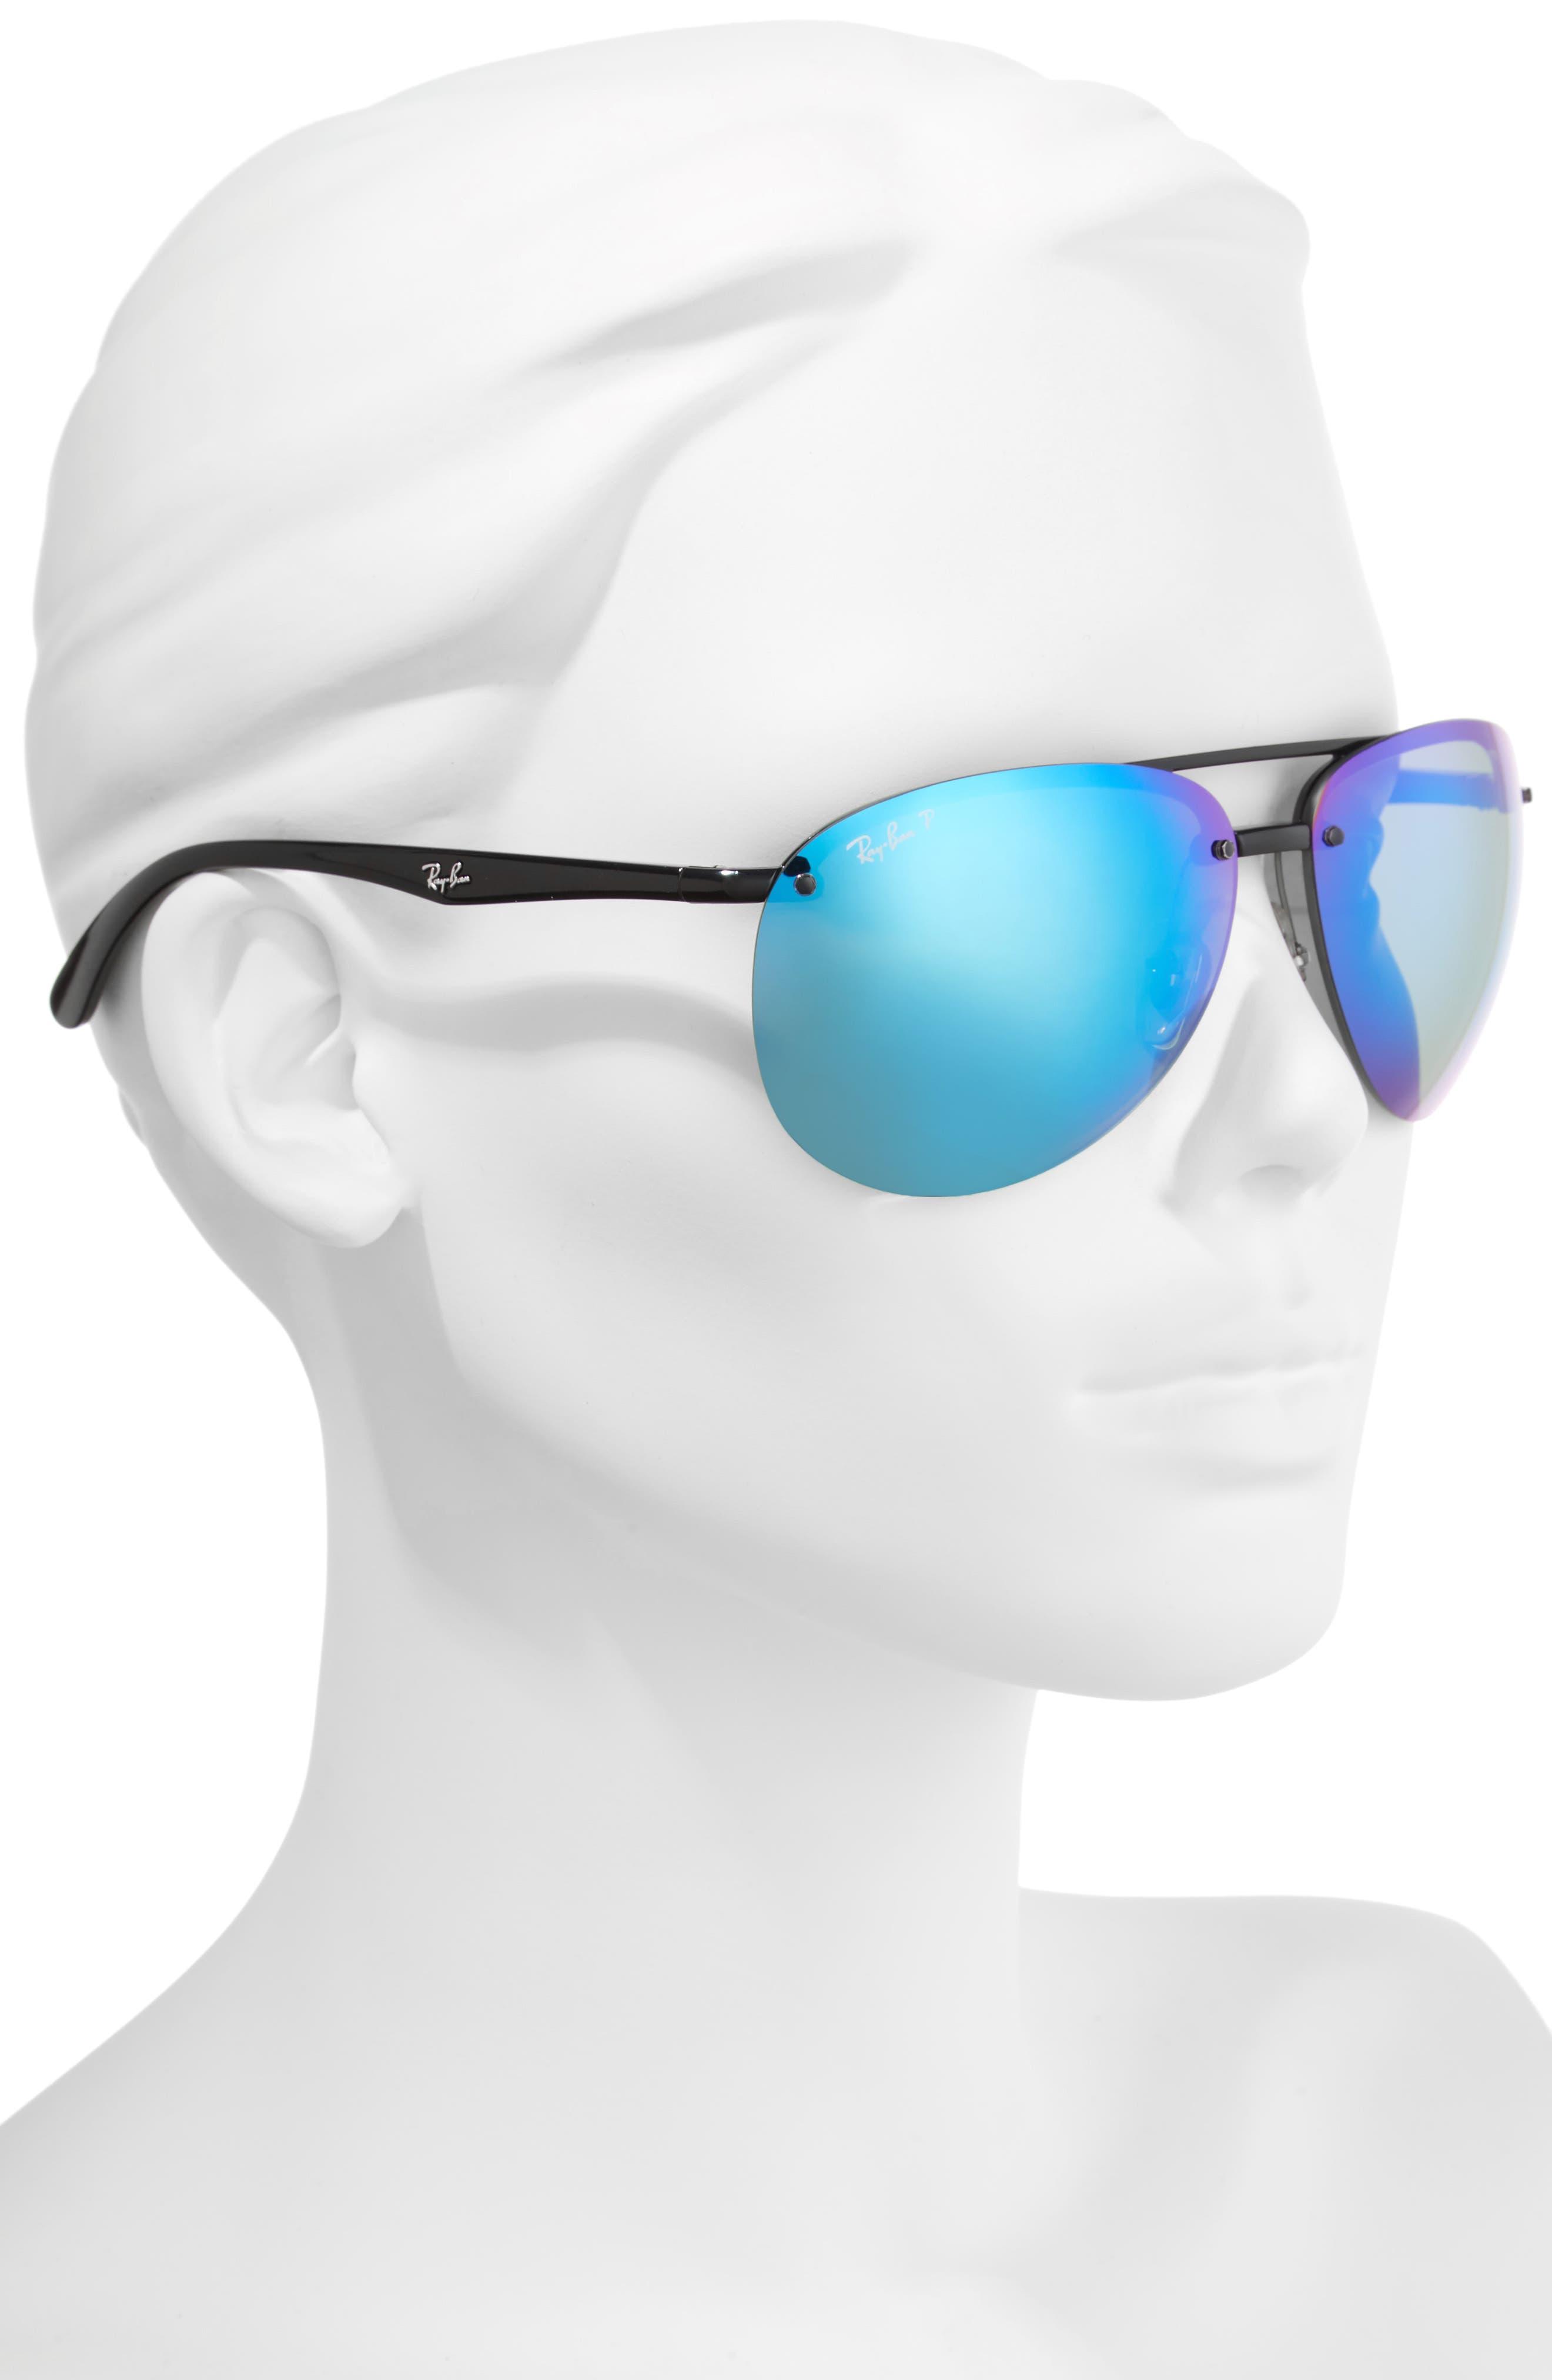 64mm Oversized Polarized Mirrored Rimless Aviator Sunglasses,                             Alternate thumbnail 2, color,                             001